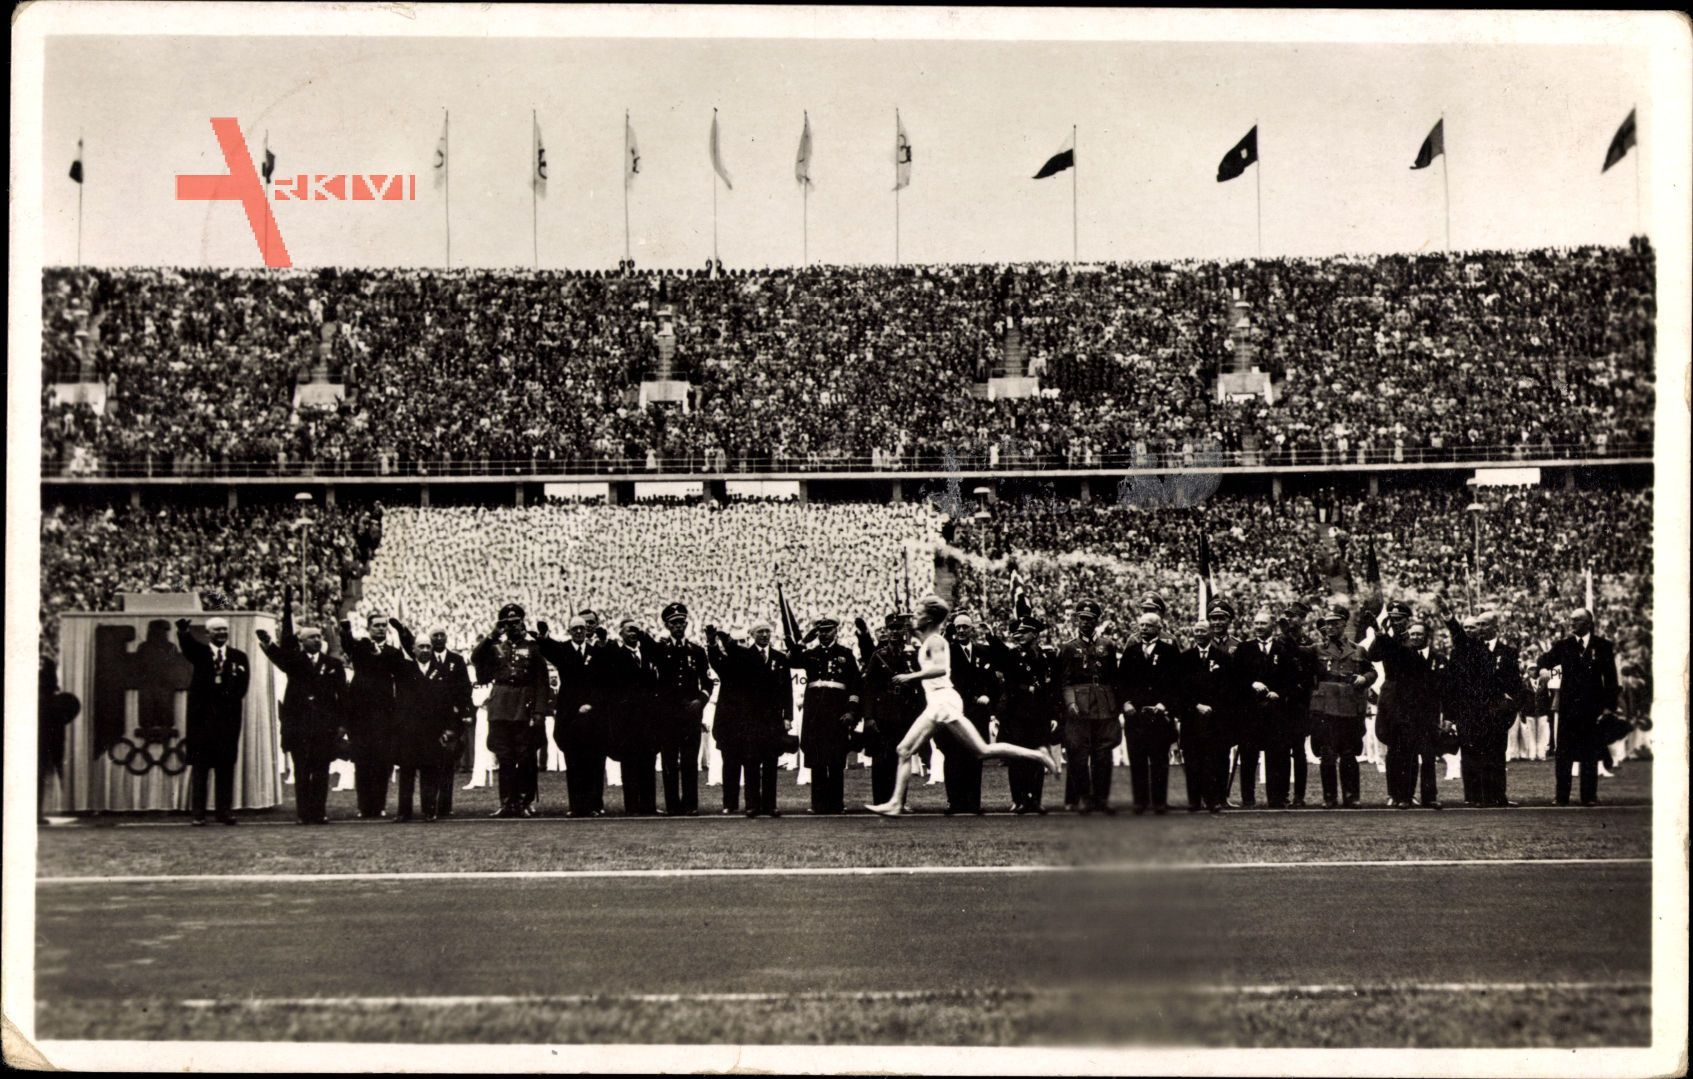 Berlin, Olympiade 1936, Fackelläufer, Fackelstaffel trifft ein,Olympiastadion